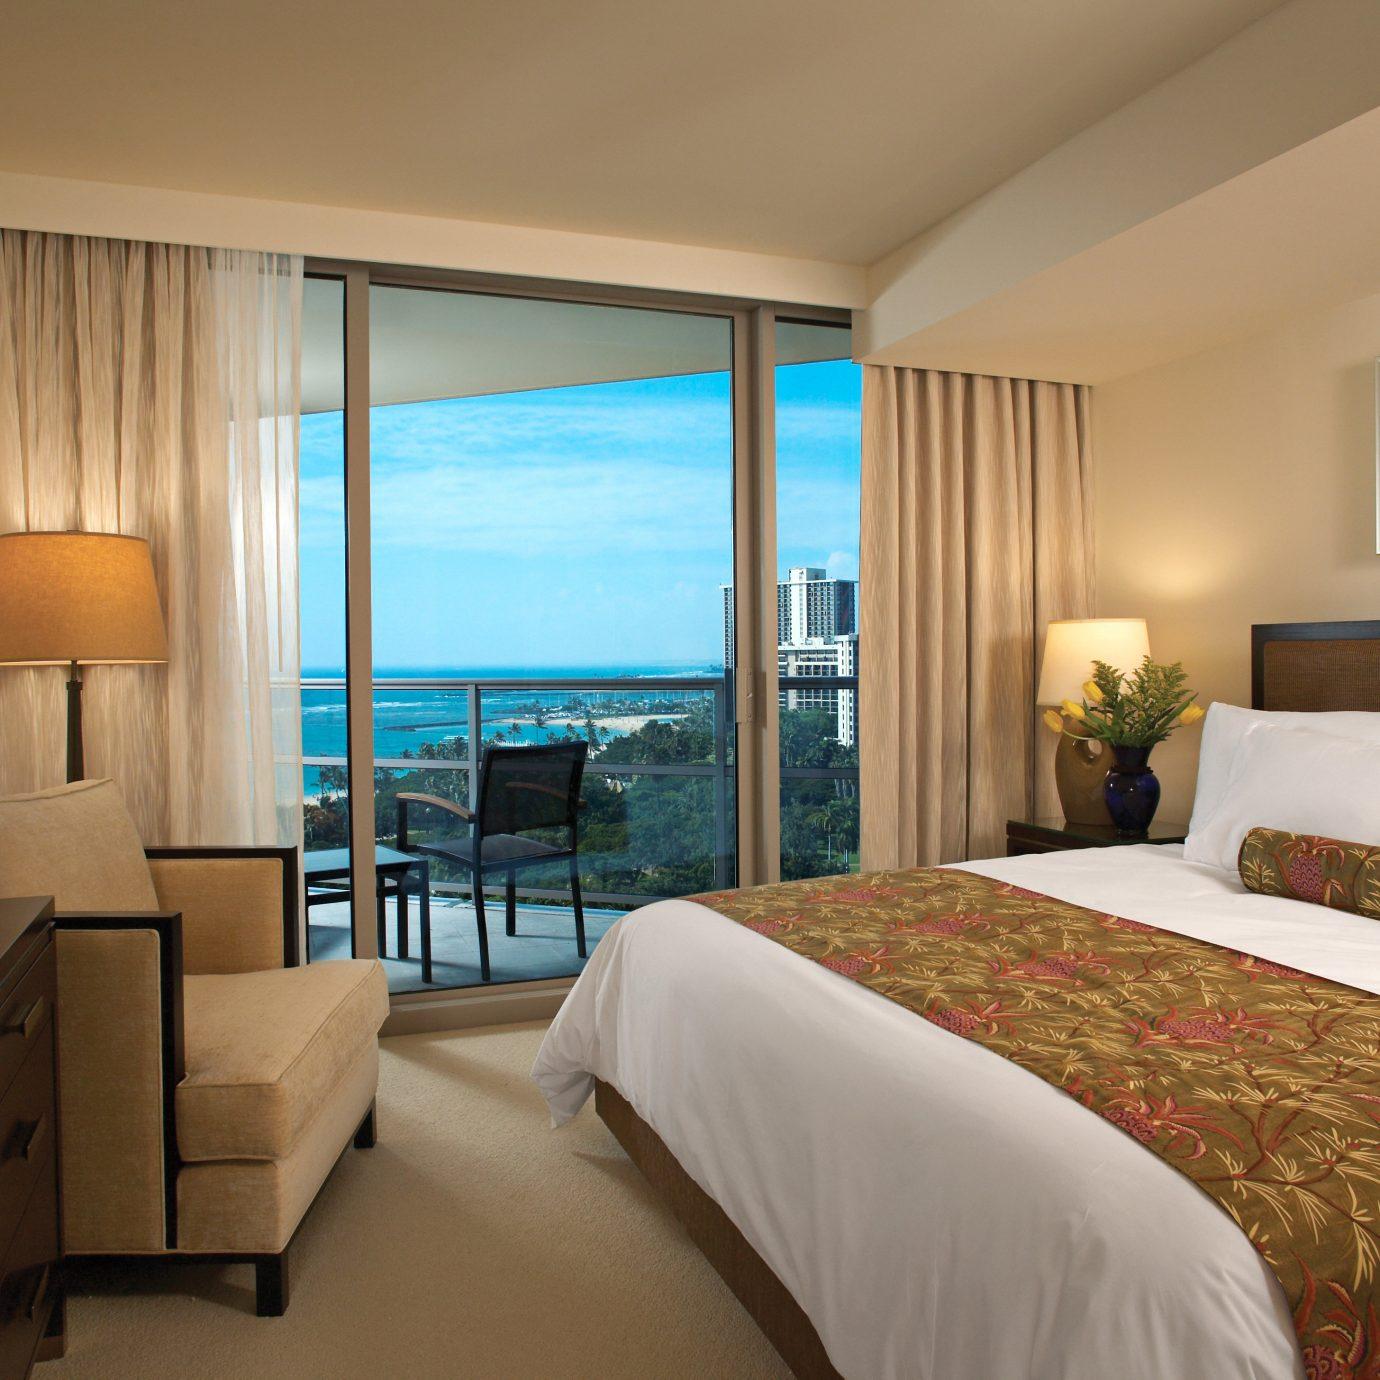 Beachfront Bedroom Luxury sofa property Suite condominium home pillow nice living room cottage beautiful